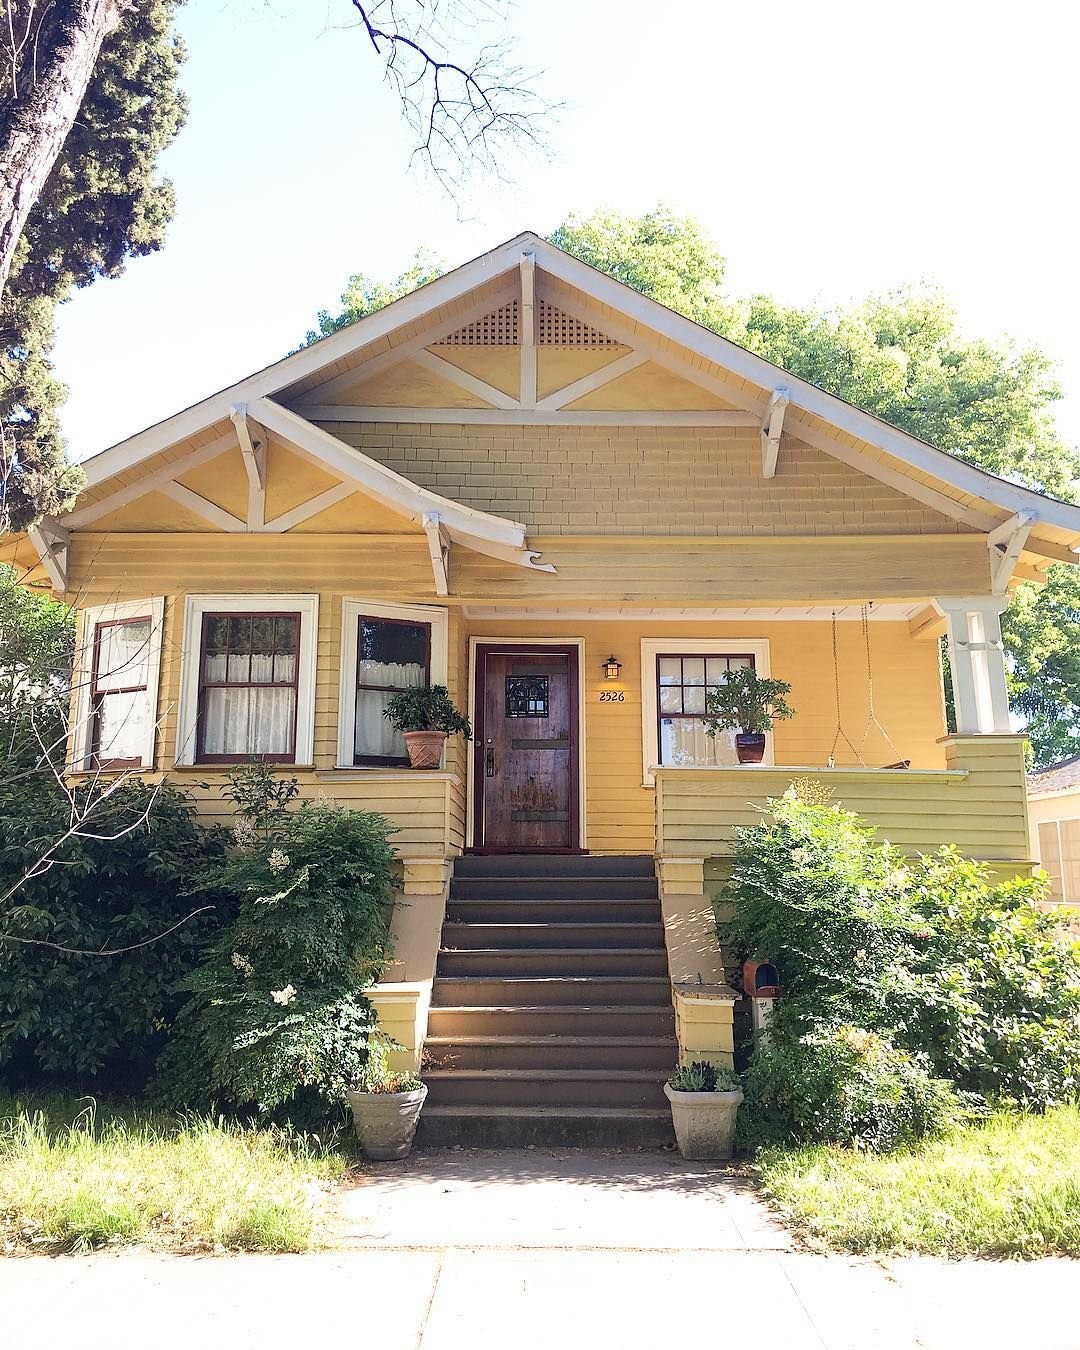 They Call Me Mellow Yelloooow Midtown Sacramento California Yellow Houses House Styles House